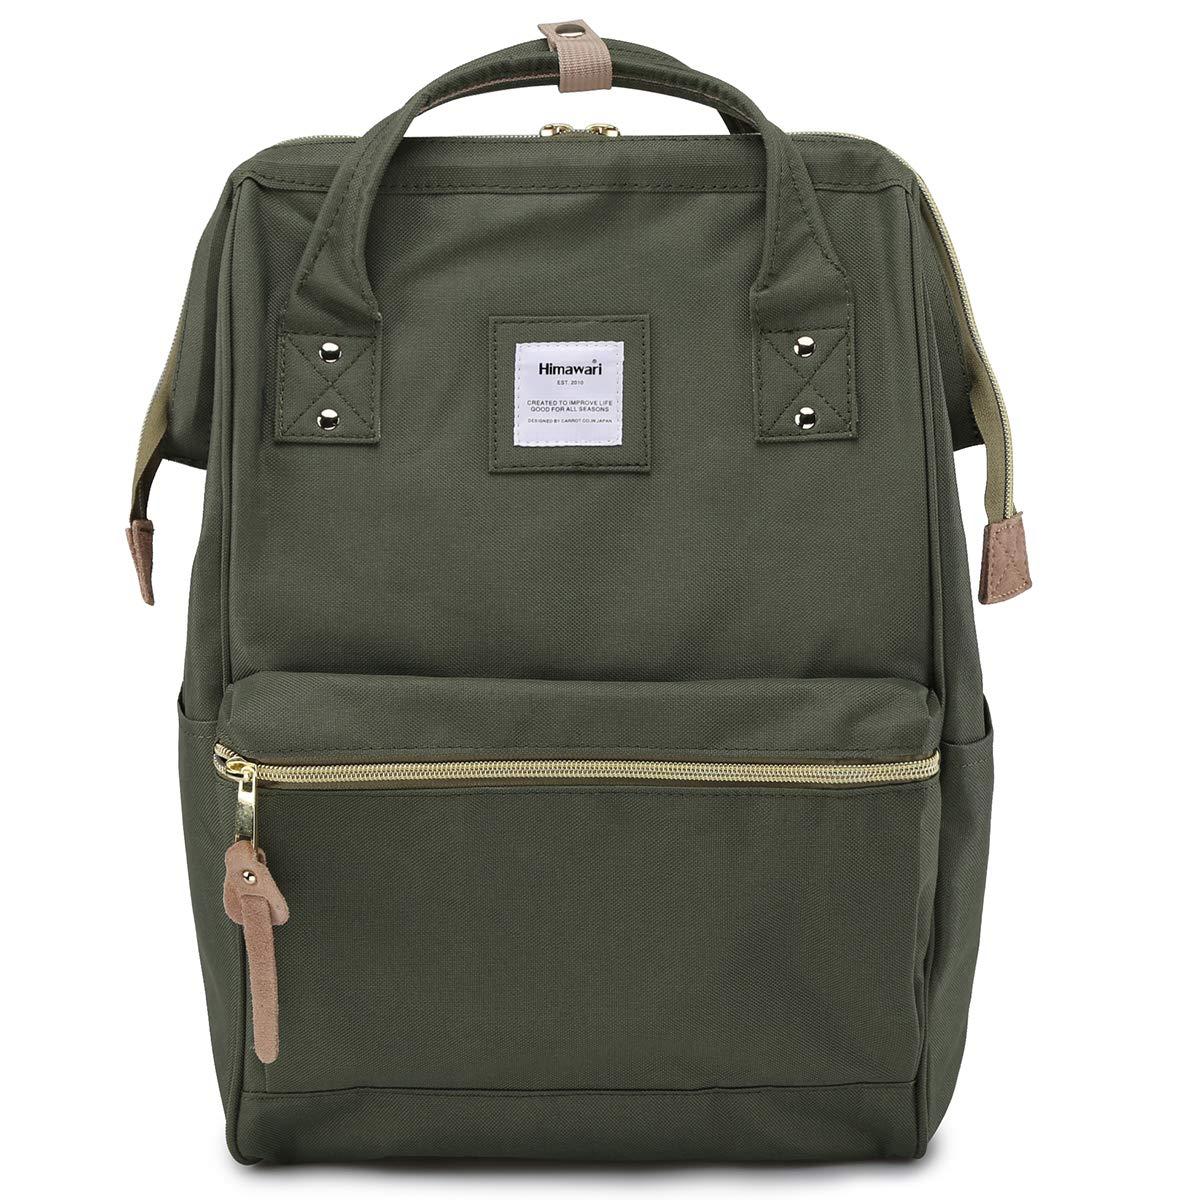 Himawari Travel Backpack Laptop Backpack Large Diaper Bag Doctor Bag Backpack School Backpack for Women&Men (xk green) by himawari